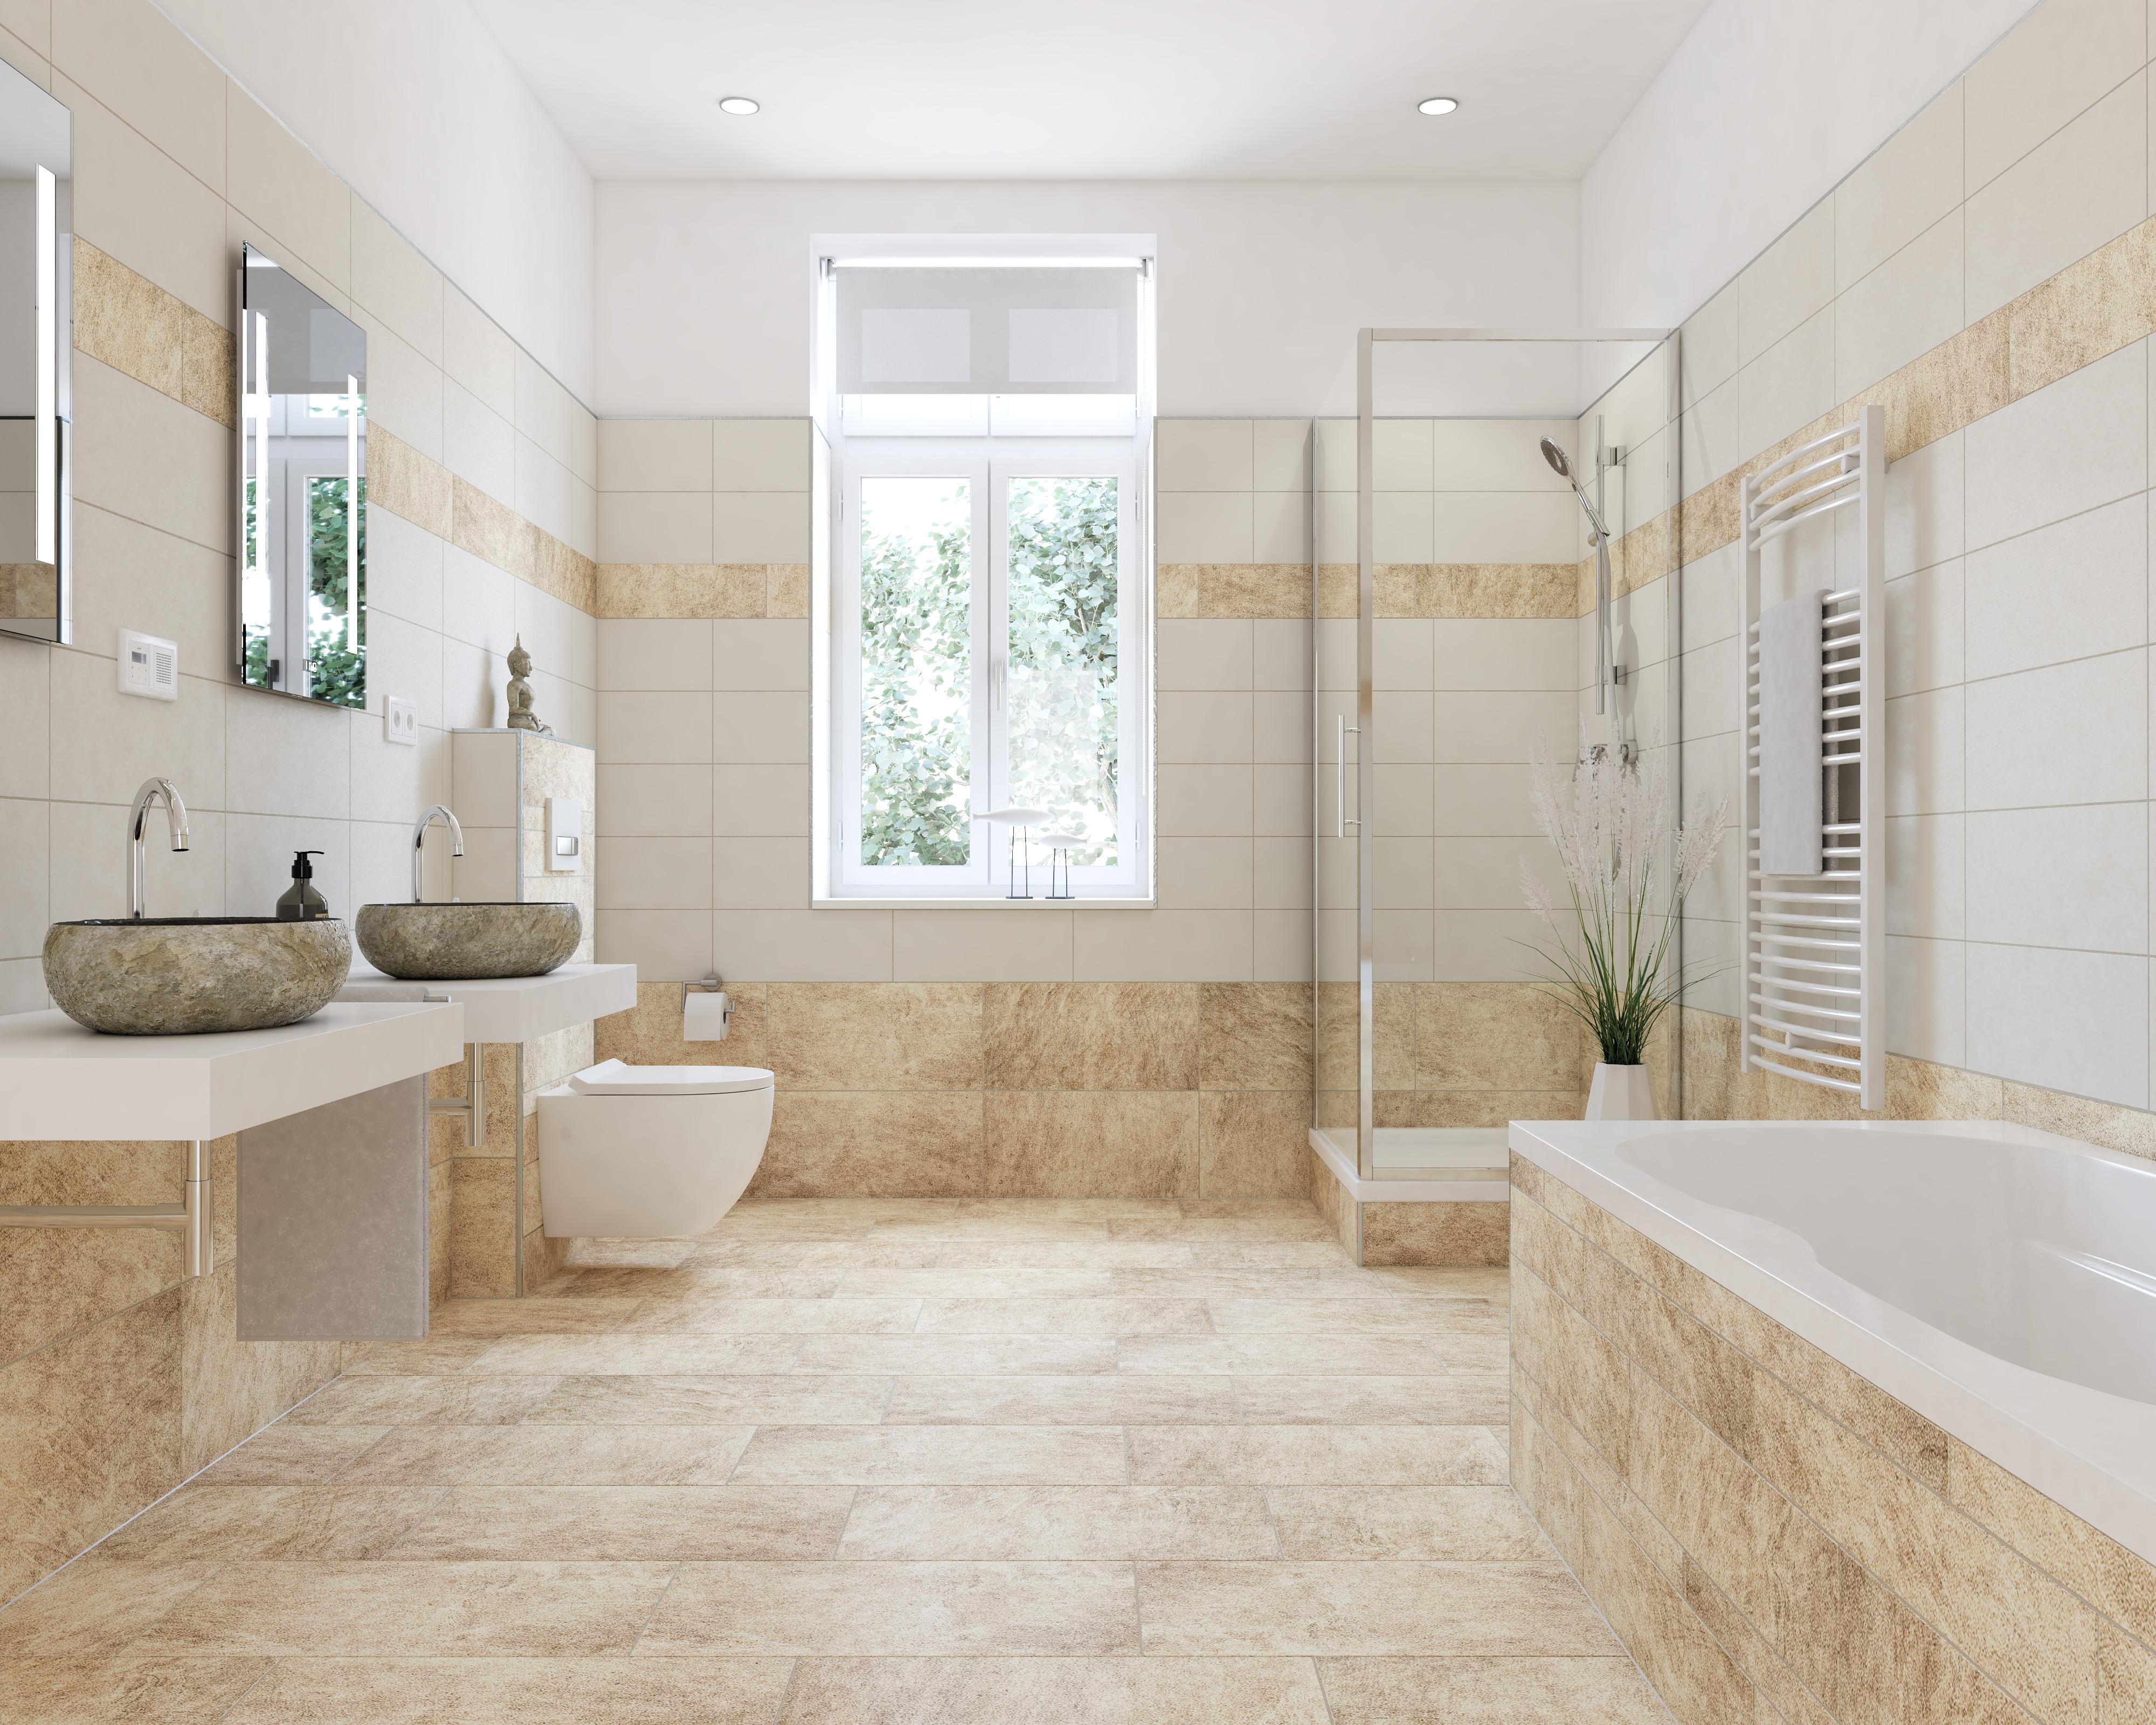 Sanierungsstandard-Badezimmer